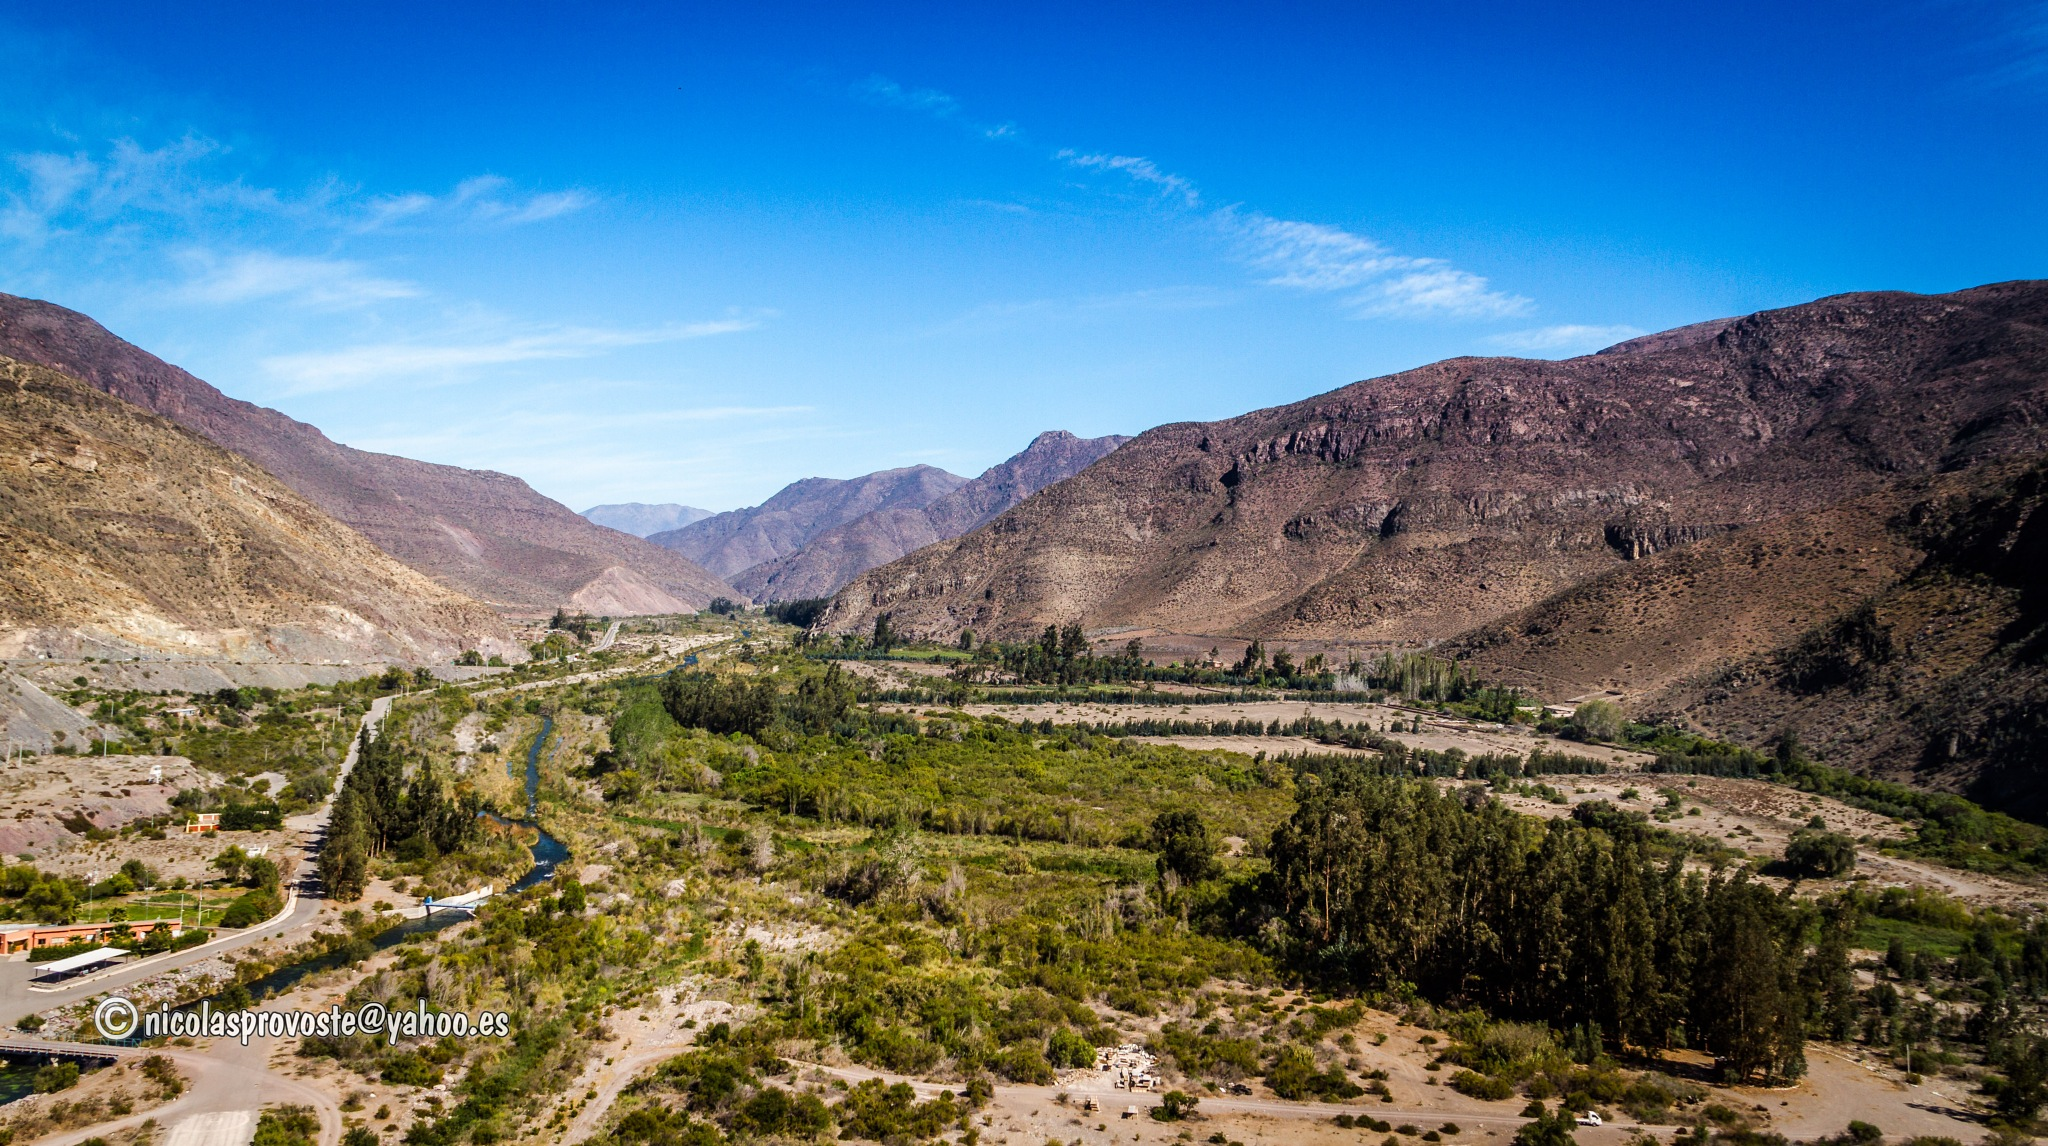 Valle del Elqui by nicolasprovoste